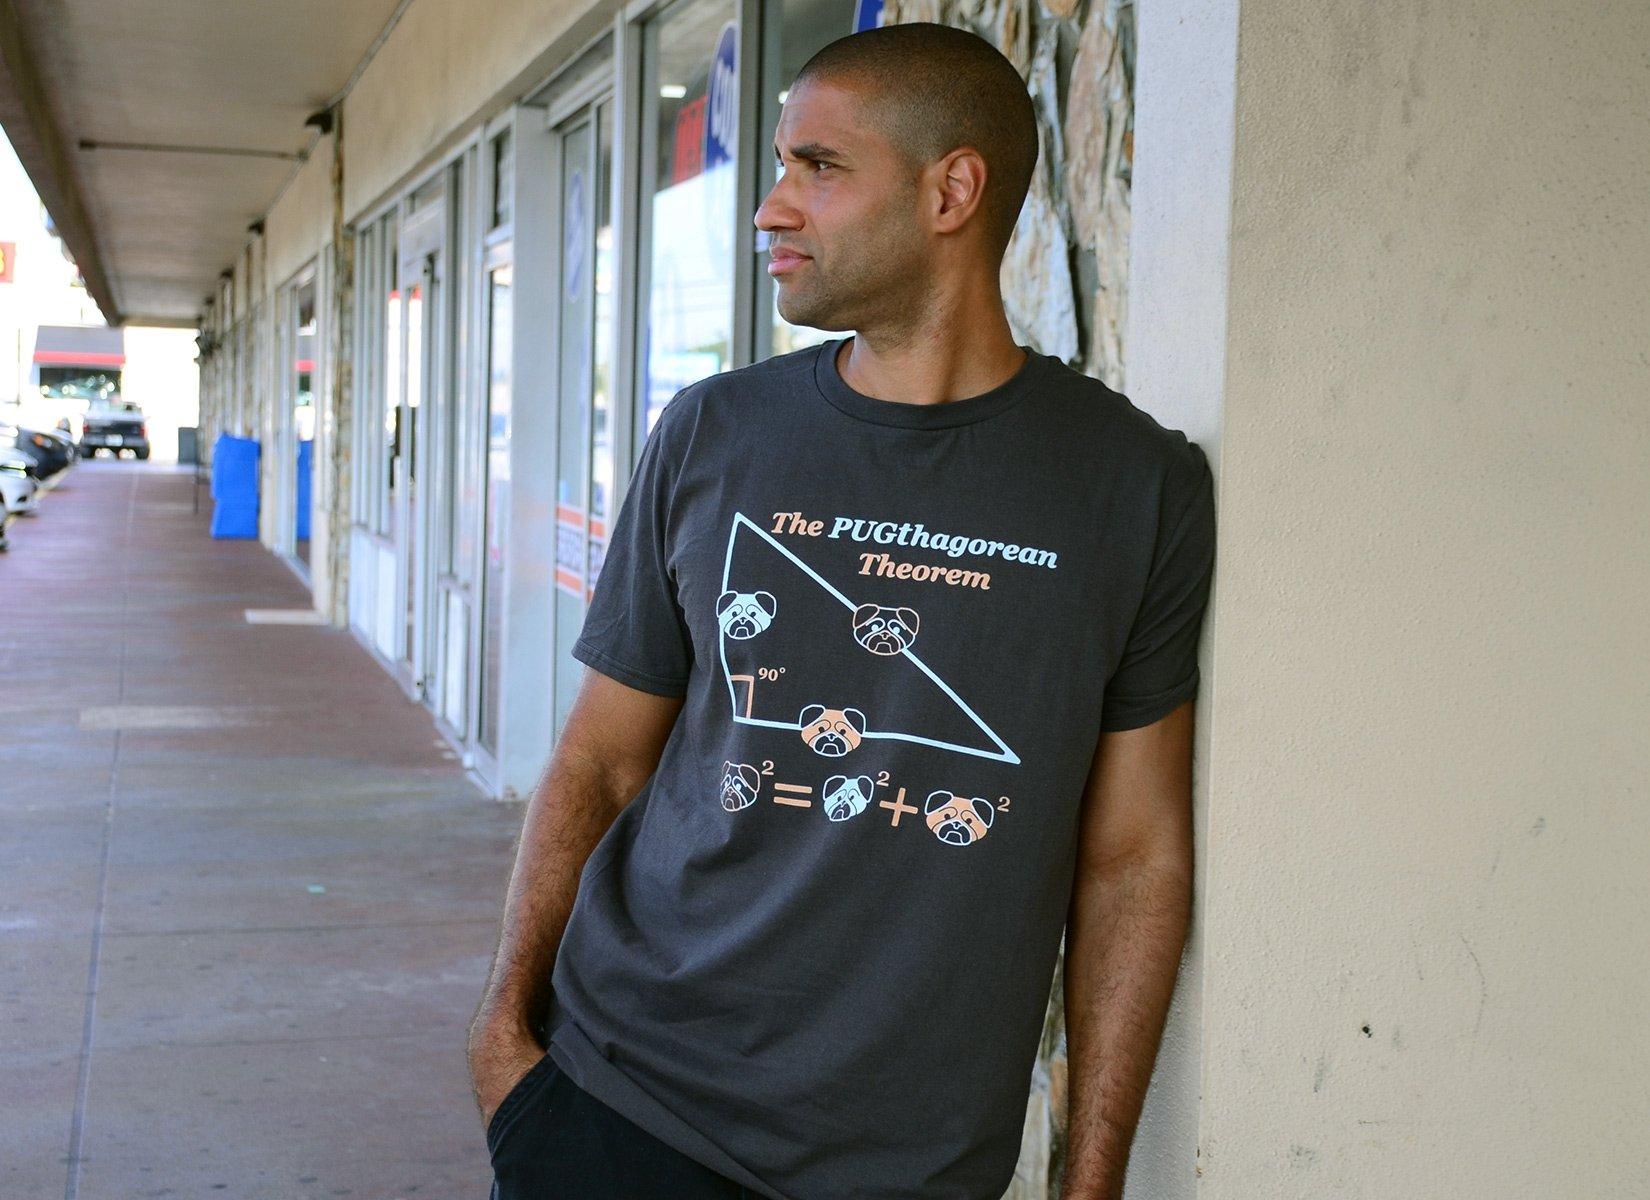 Pugthagorean Theorem on Mens T-Shirt